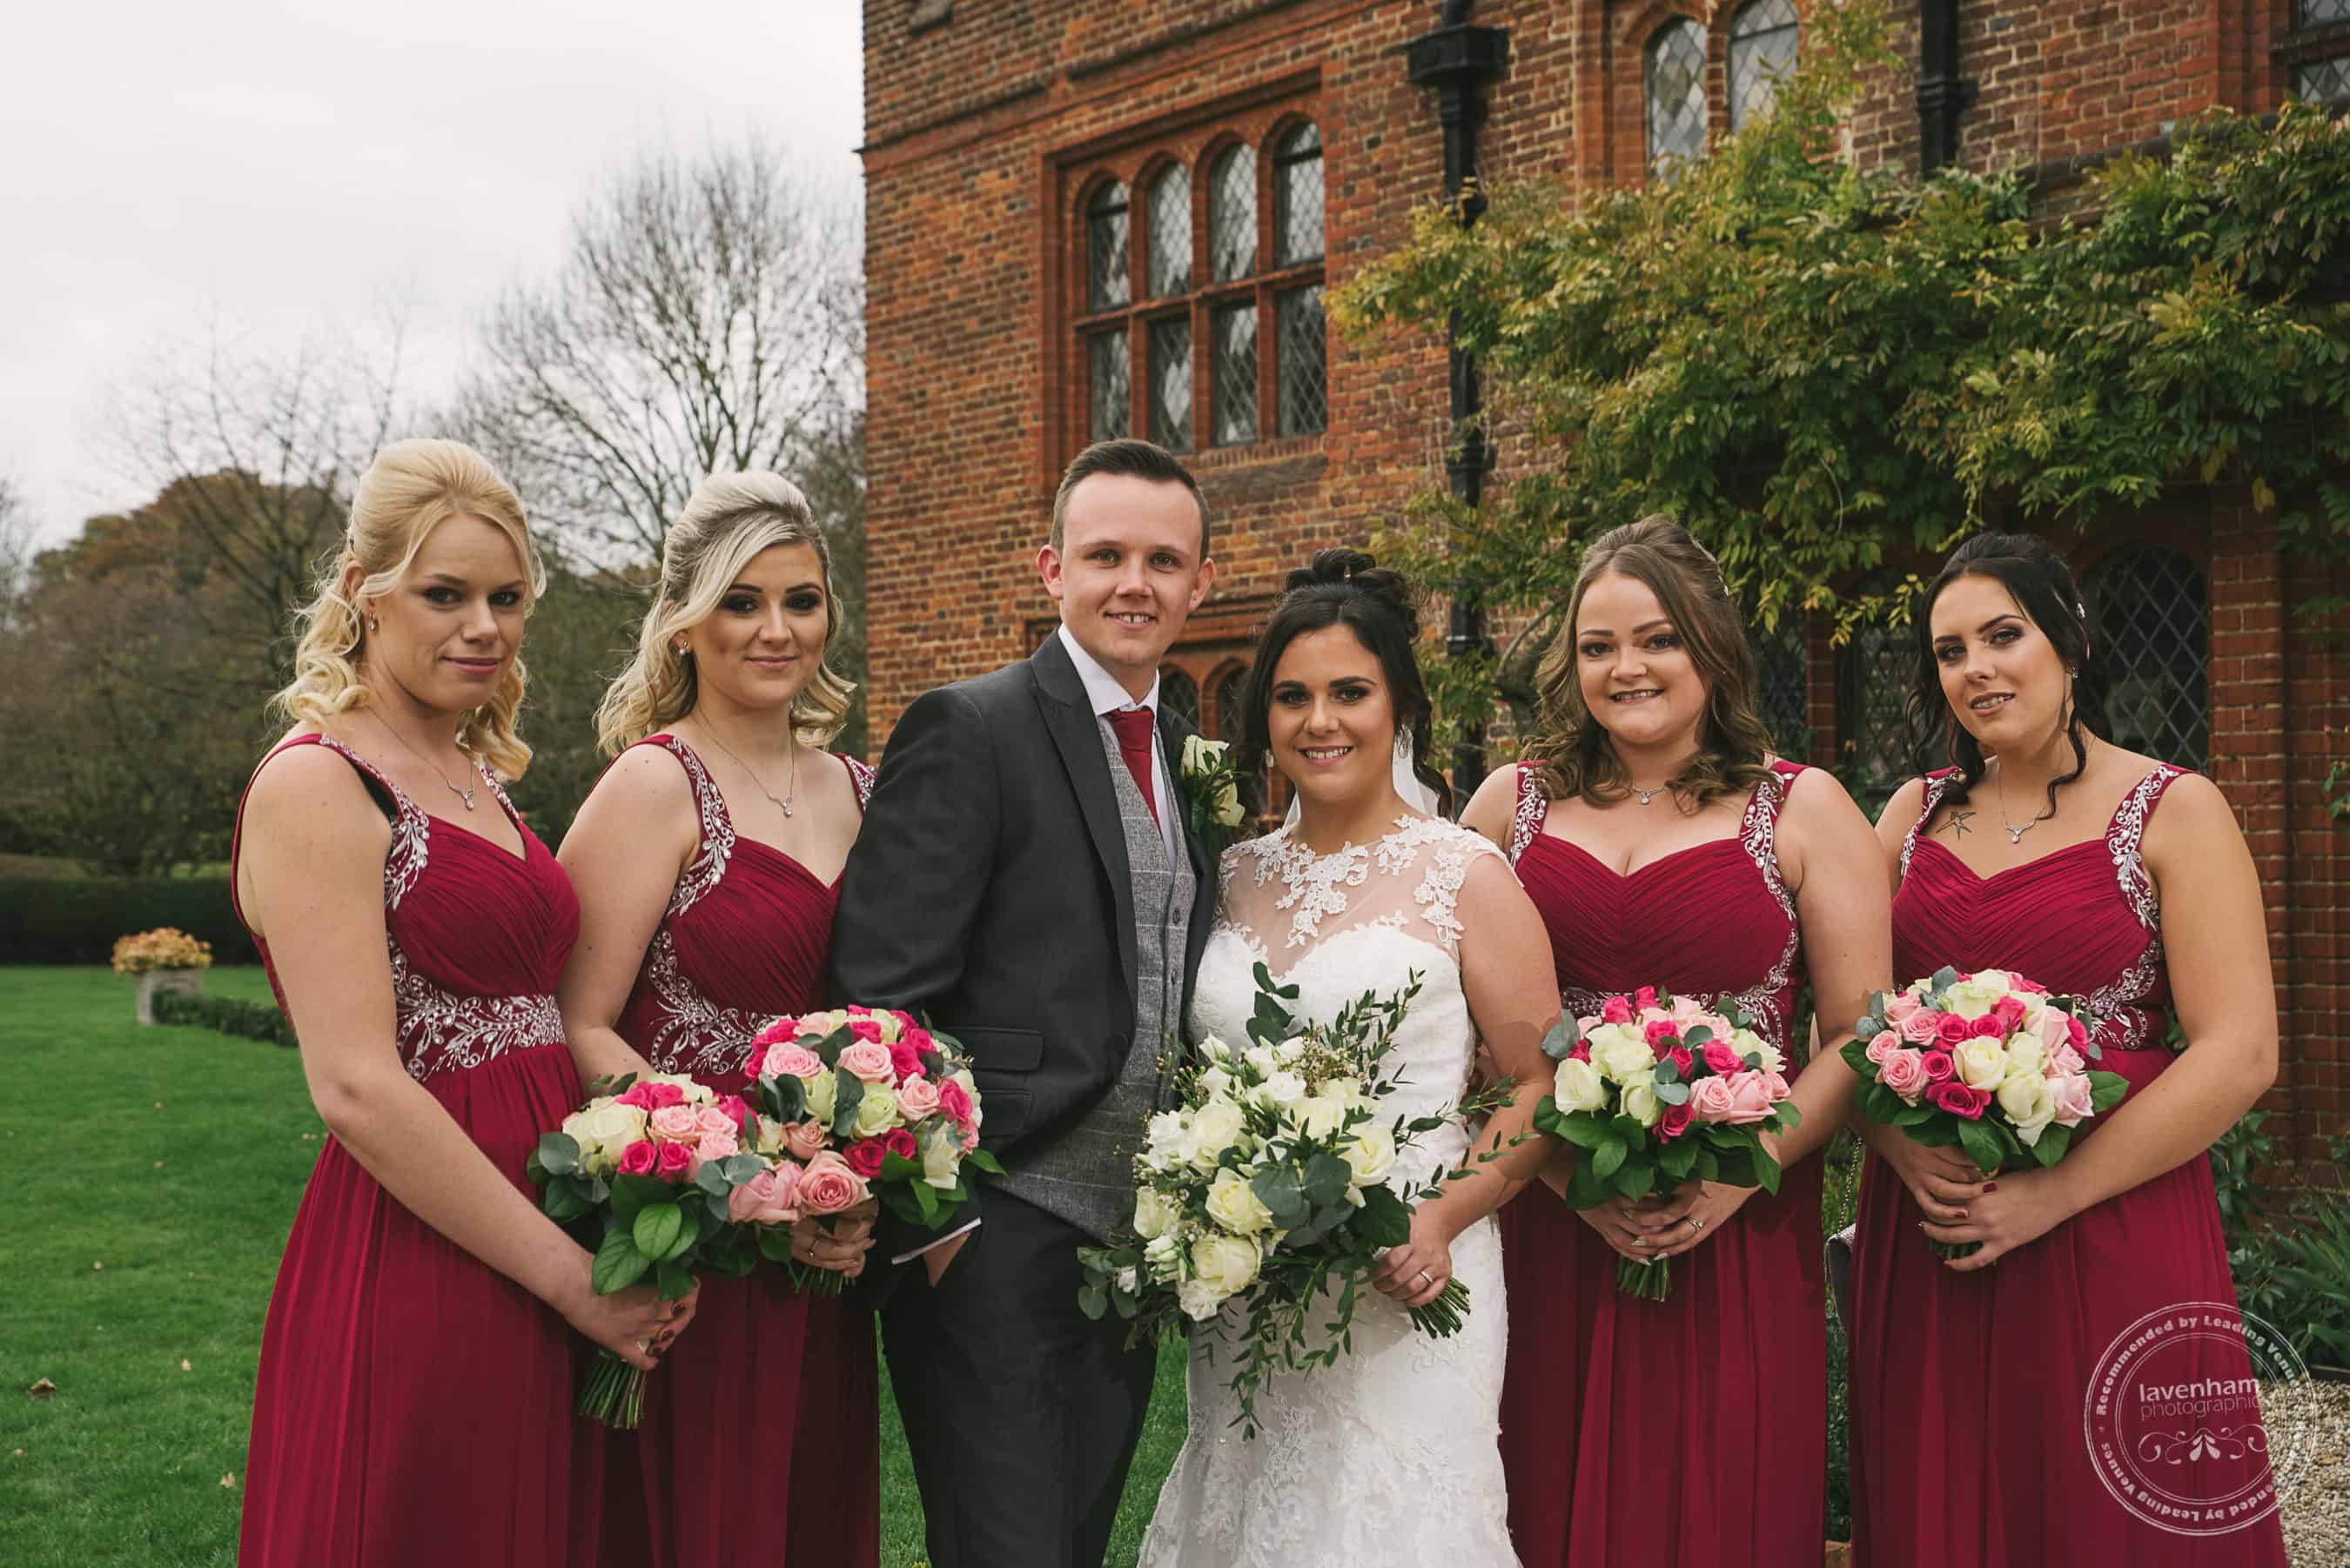 251118 Leez Priory Wedding Photography by Lavenham Photographic 065